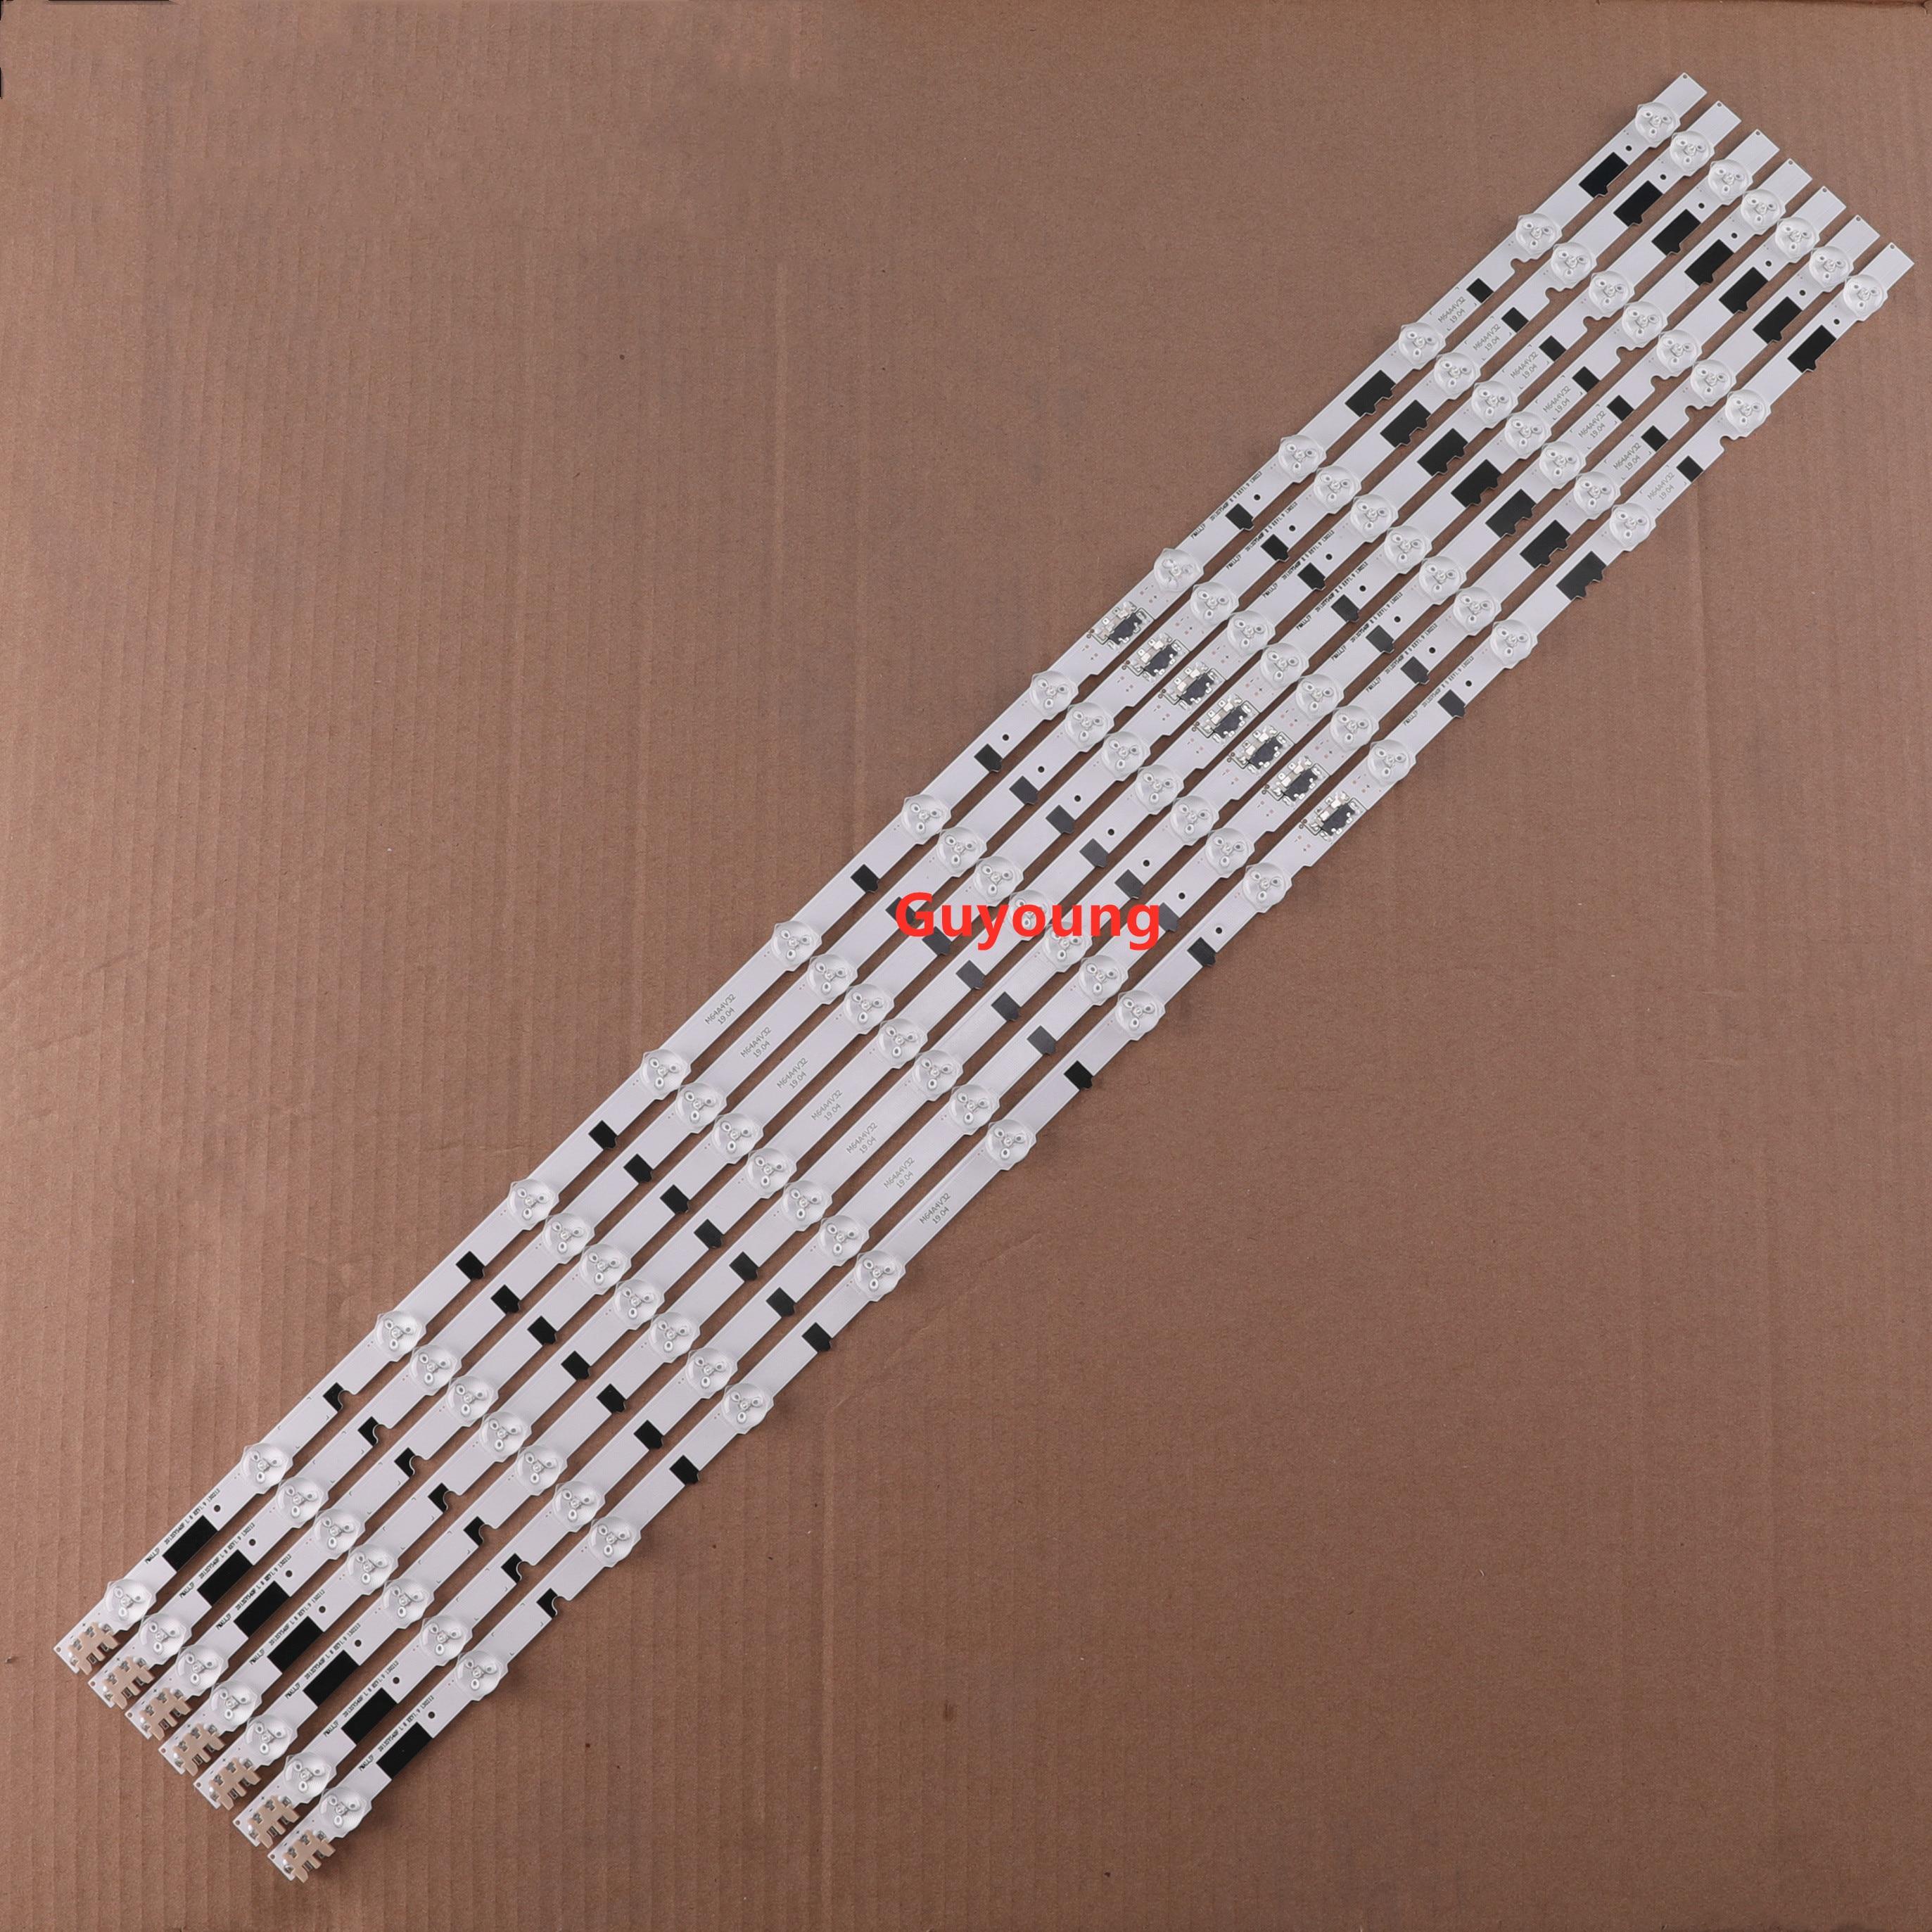 14PCS/set LED Strip For Samsung UE40F6400 D2GE-400SCA-R3 D2GE-400SCB-R3 2013SVS40F L8 R 5 BN96-25520A 25521A 25304A 25305A